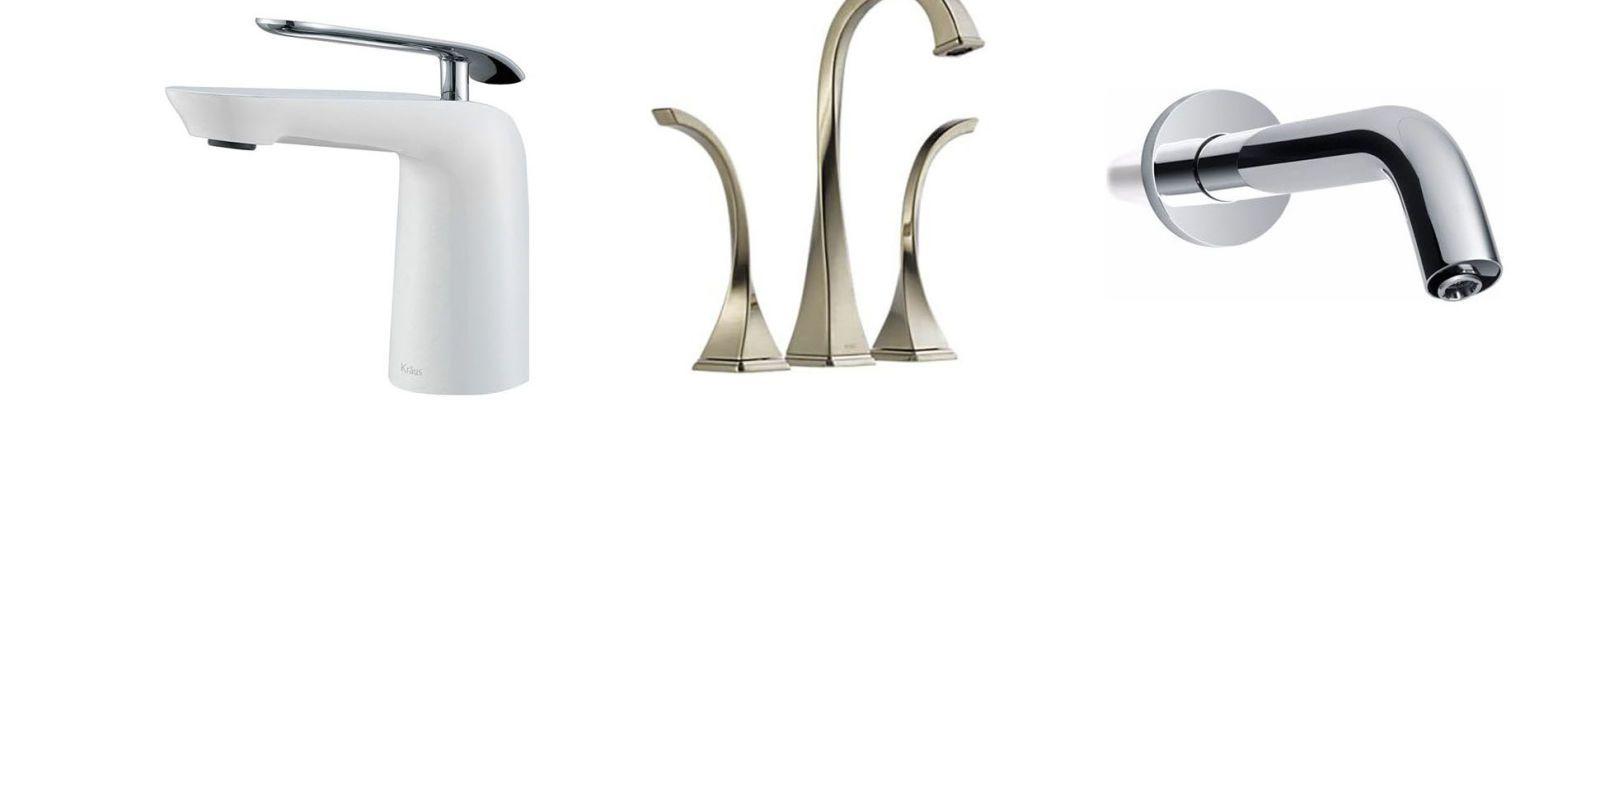 bathtub and bathroom sink faucets